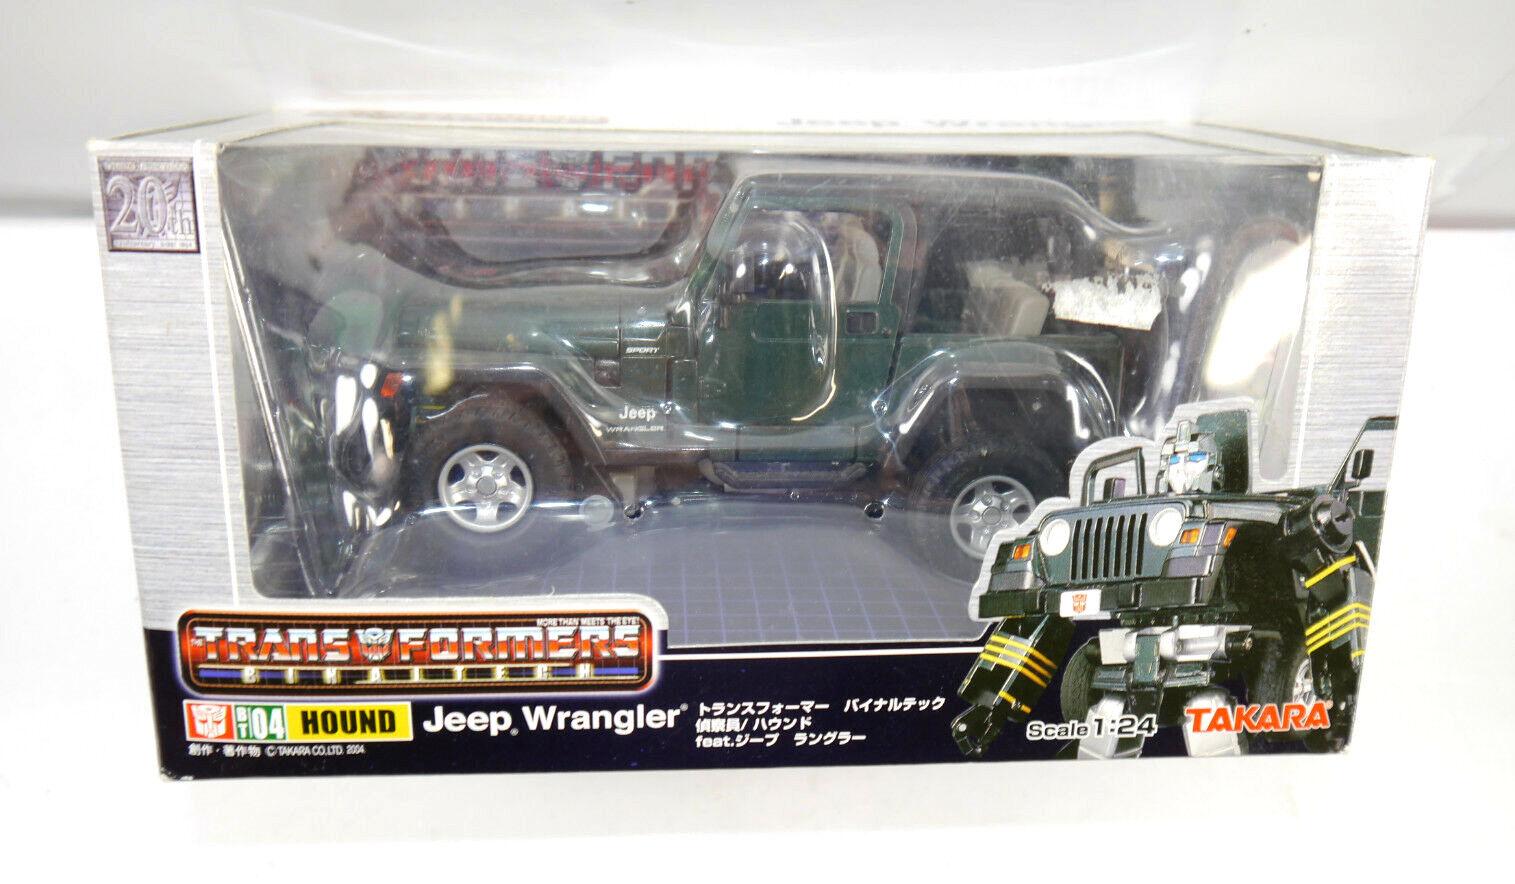 Transformers Binaitech BT04 Hound Jeep Wrangler Auto   Figurine D'Action Takara